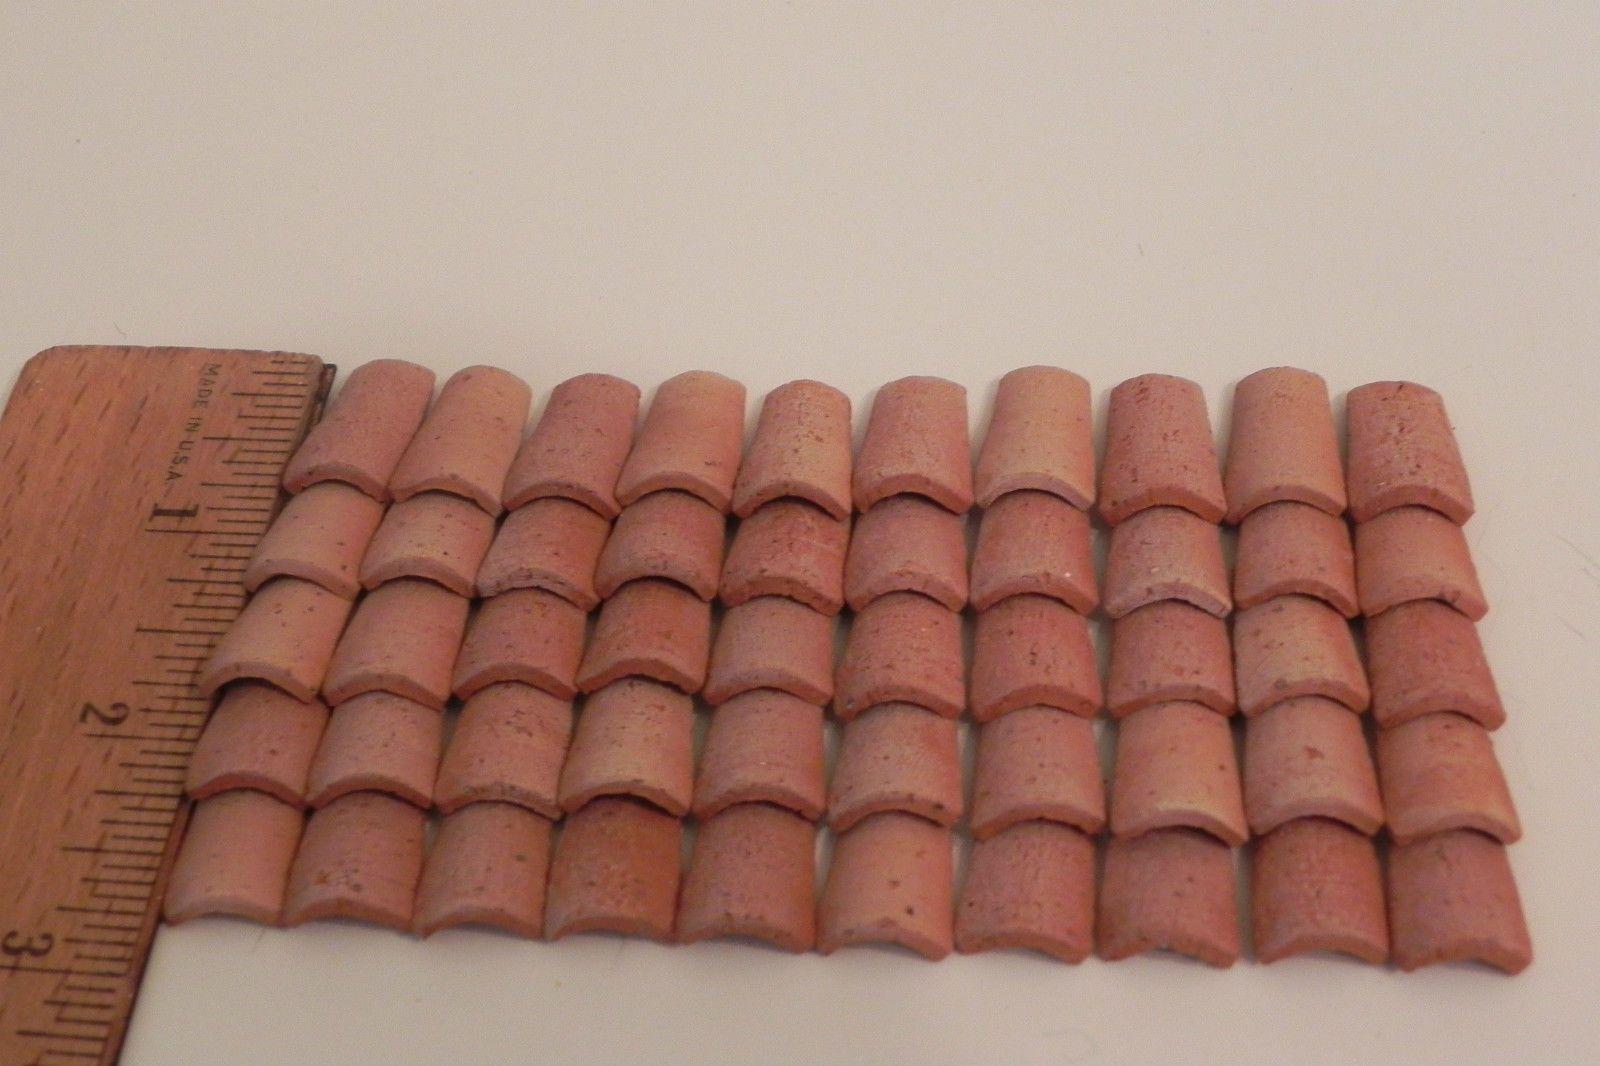 Dollhouse Miniature Spanish Barrel  Terra Cotta Tiles 50 pcs.